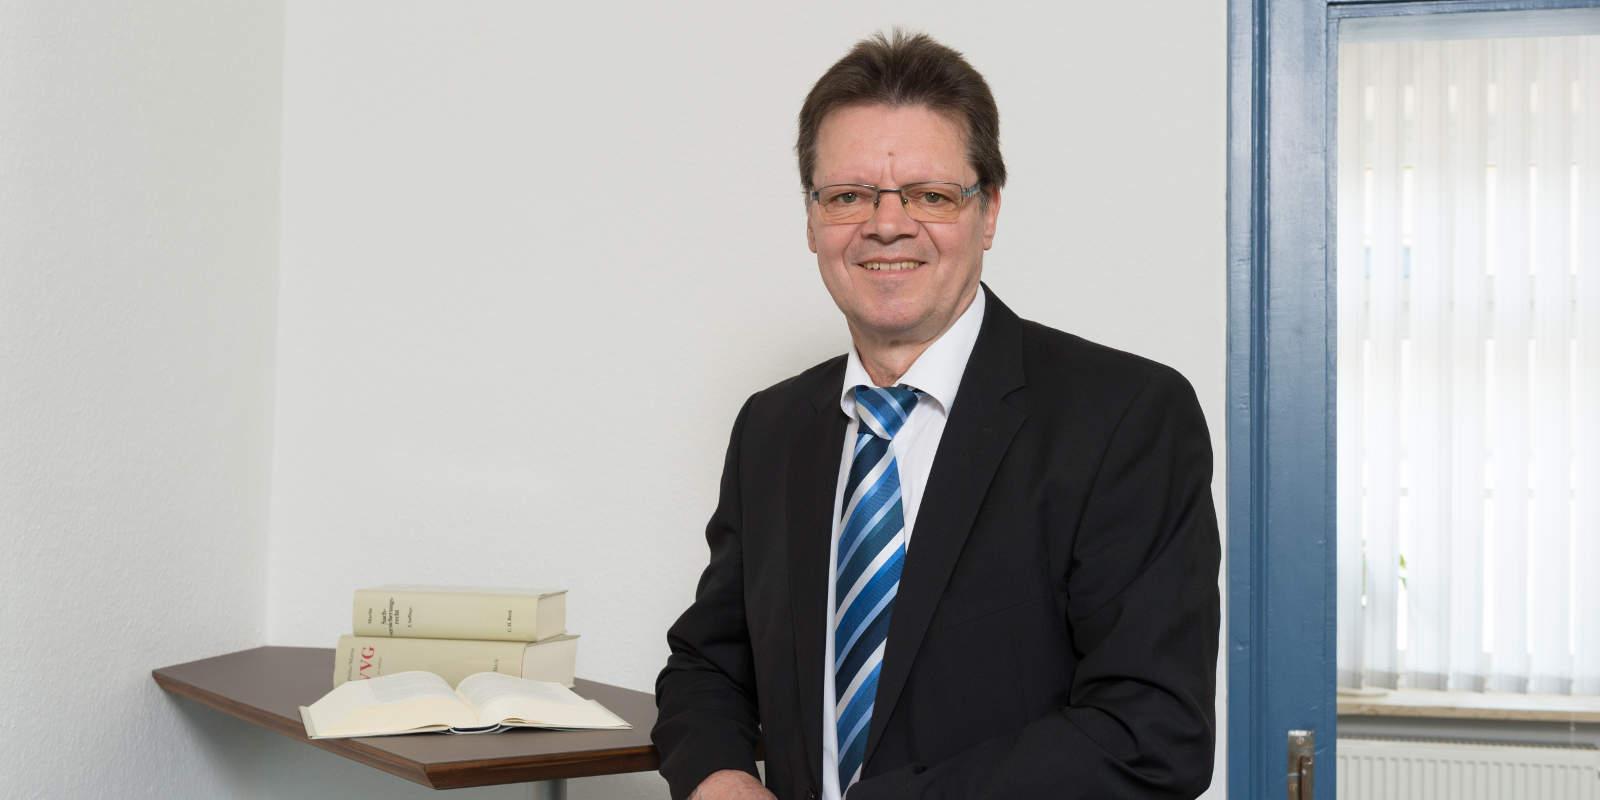 Porträt Rüdiger Falken, Rentenberater und Versicherungsberater